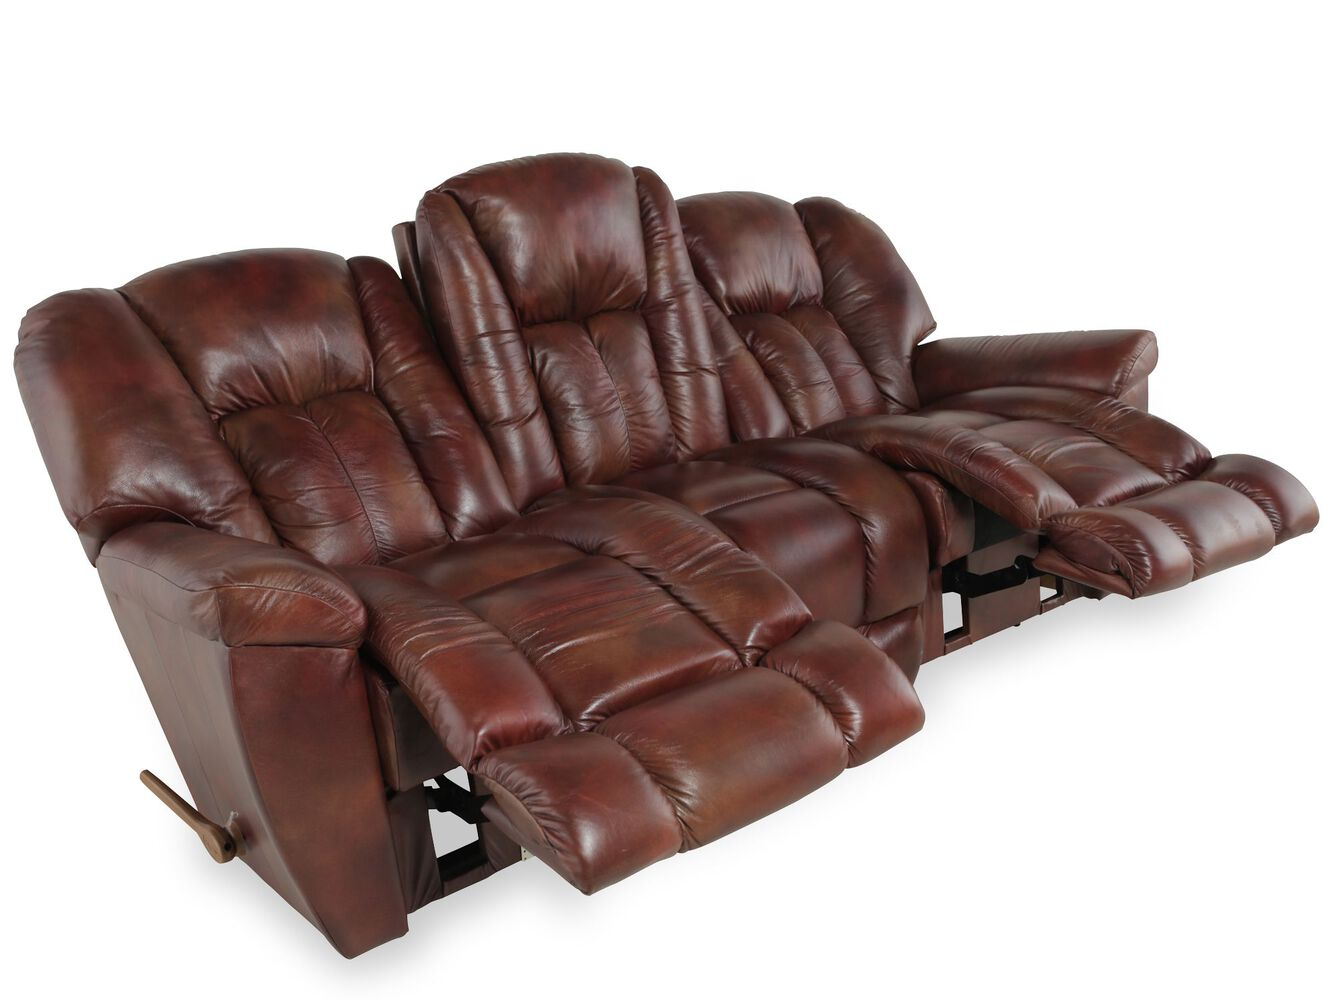 lazy boy maverick sofa la z boy maverick mahogany. Black Bedroom Furniture Sets. Home Design Ideas